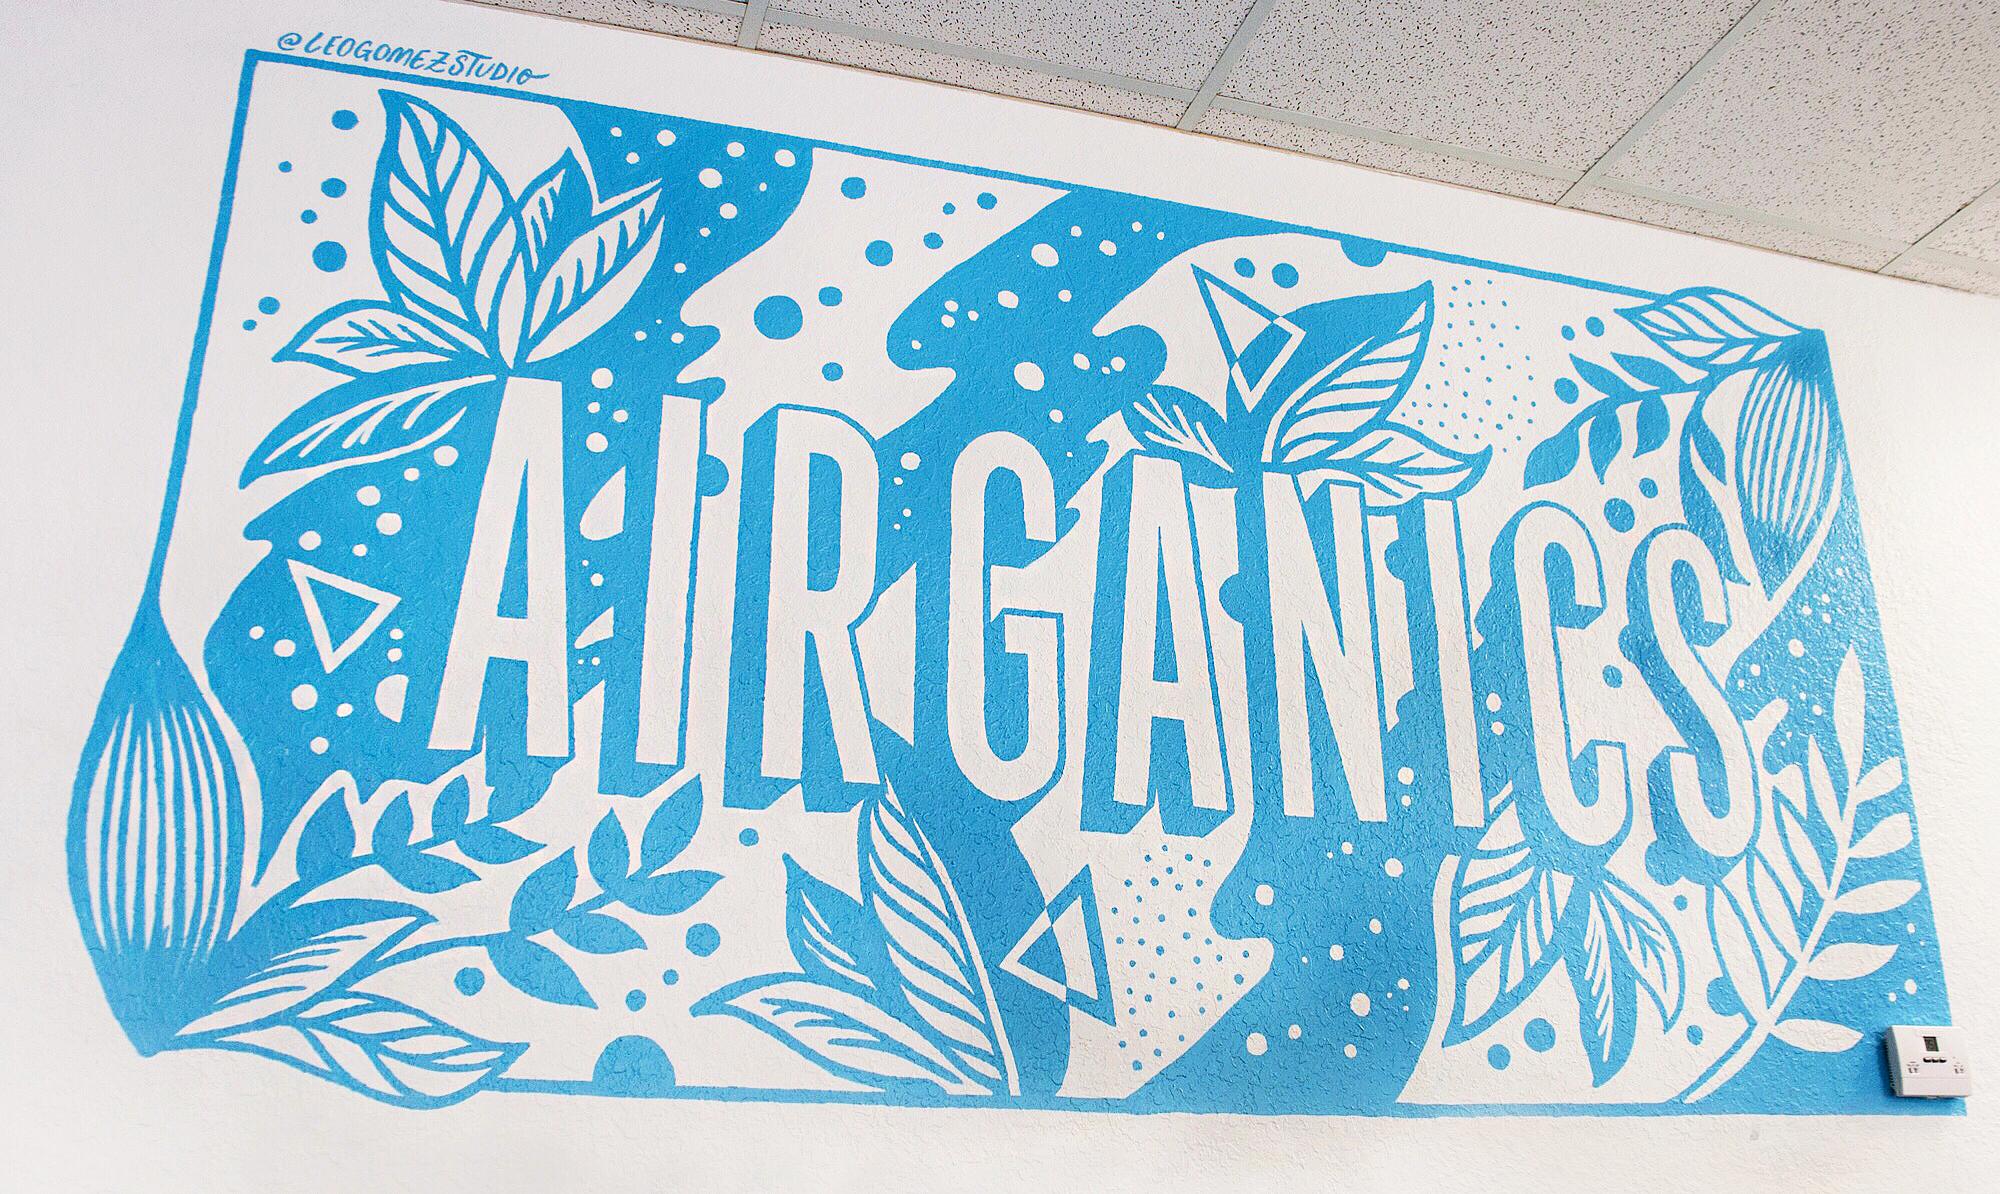 Leo-Gomez-Studio-Airganics-Office-Mural.jpg